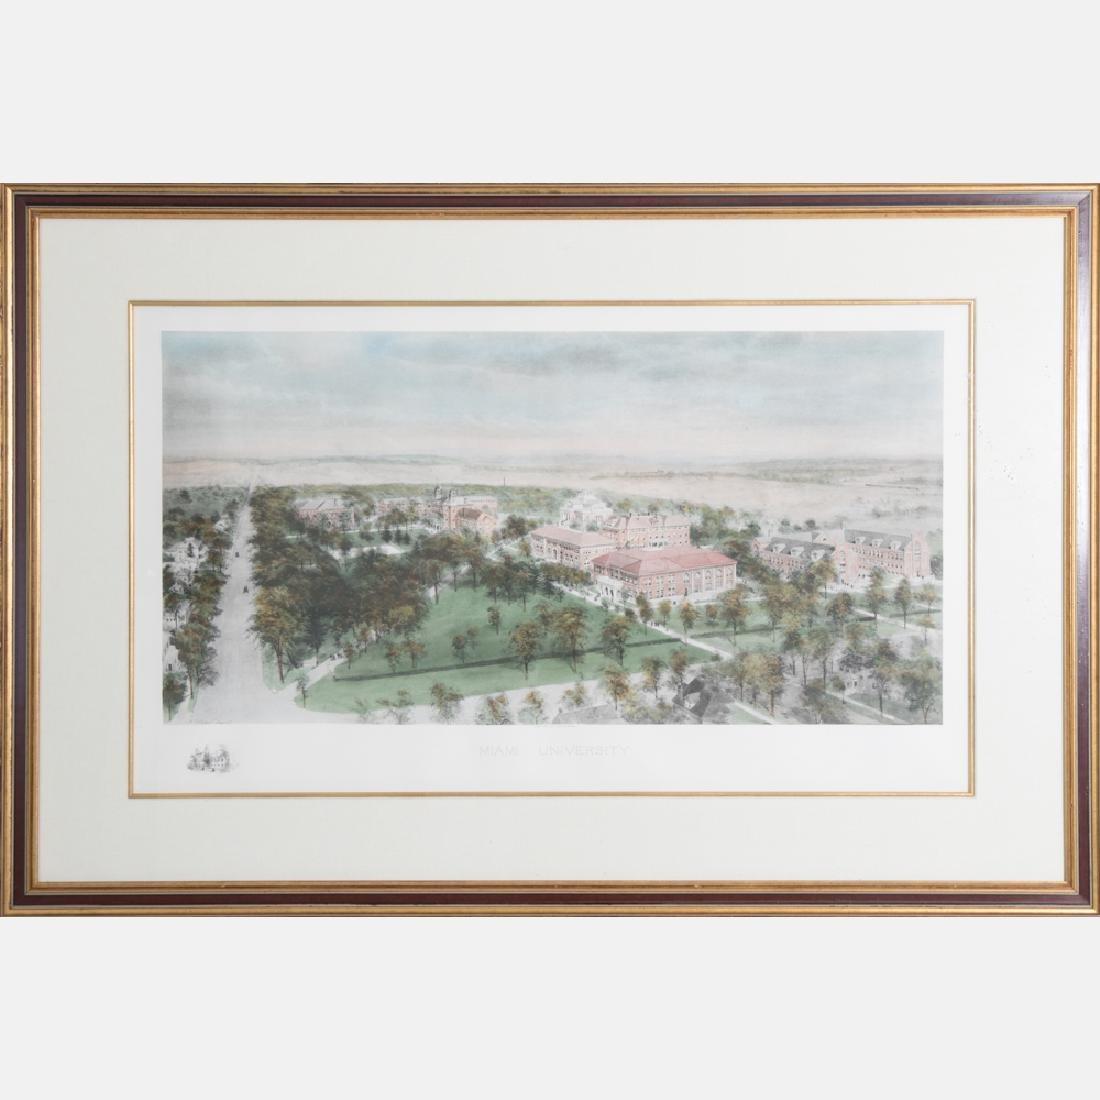 Richard Rummell (1848-1924) Miami University, Hand